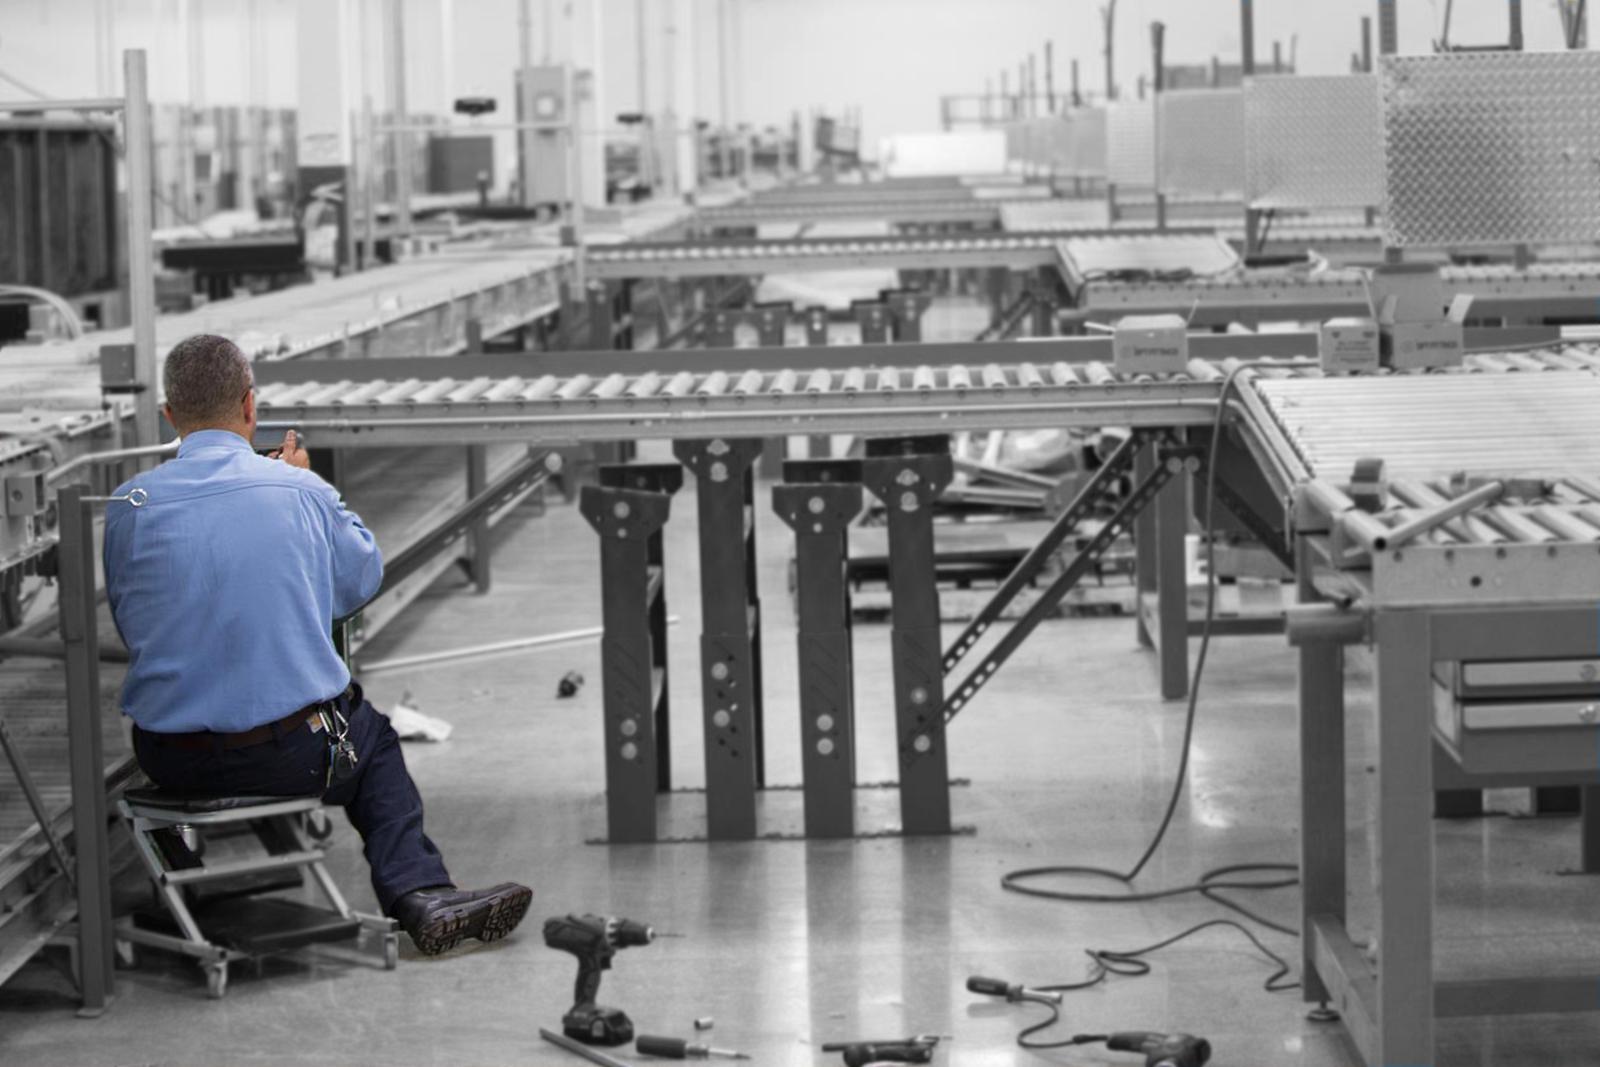 General Maintenance Welder